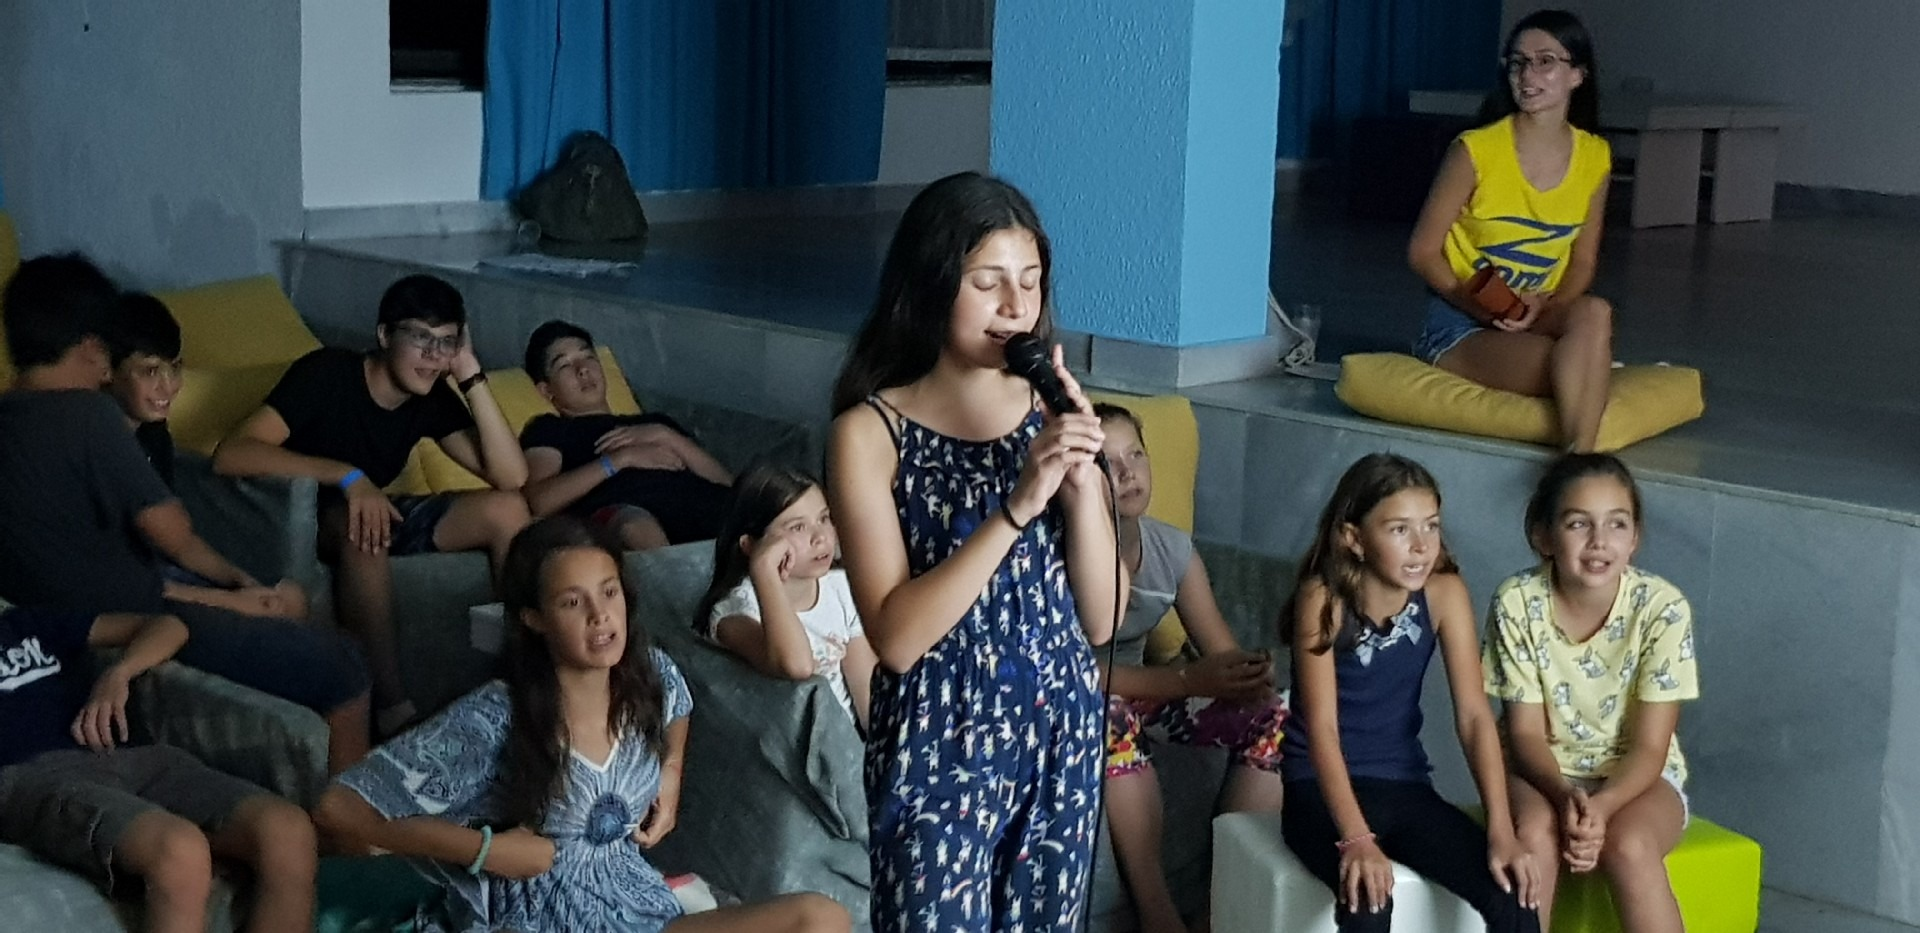 летни езикови лагери за деца Z кемп, ден 31 - караоке вечер, момиче пее пред микрофон